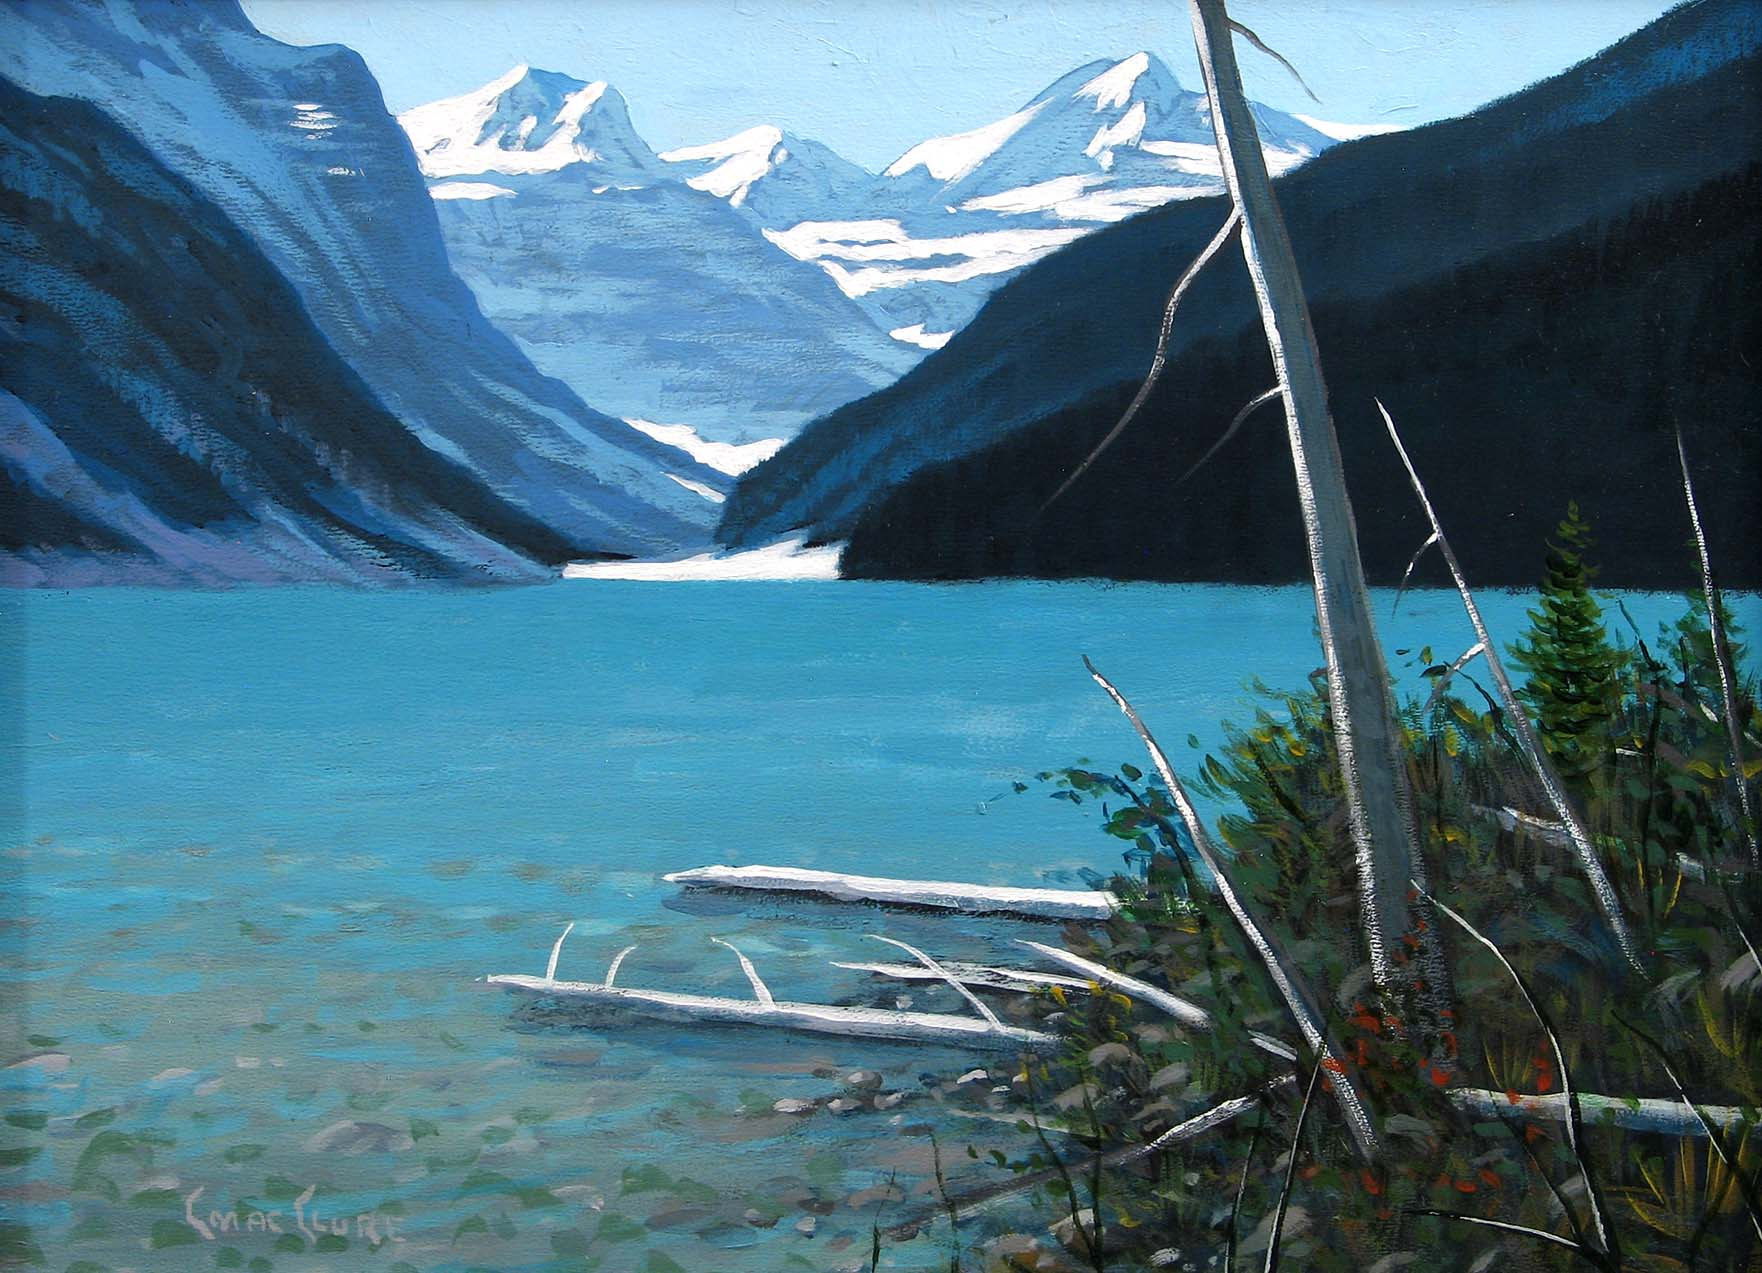 Wintergreen - Chris MacClure